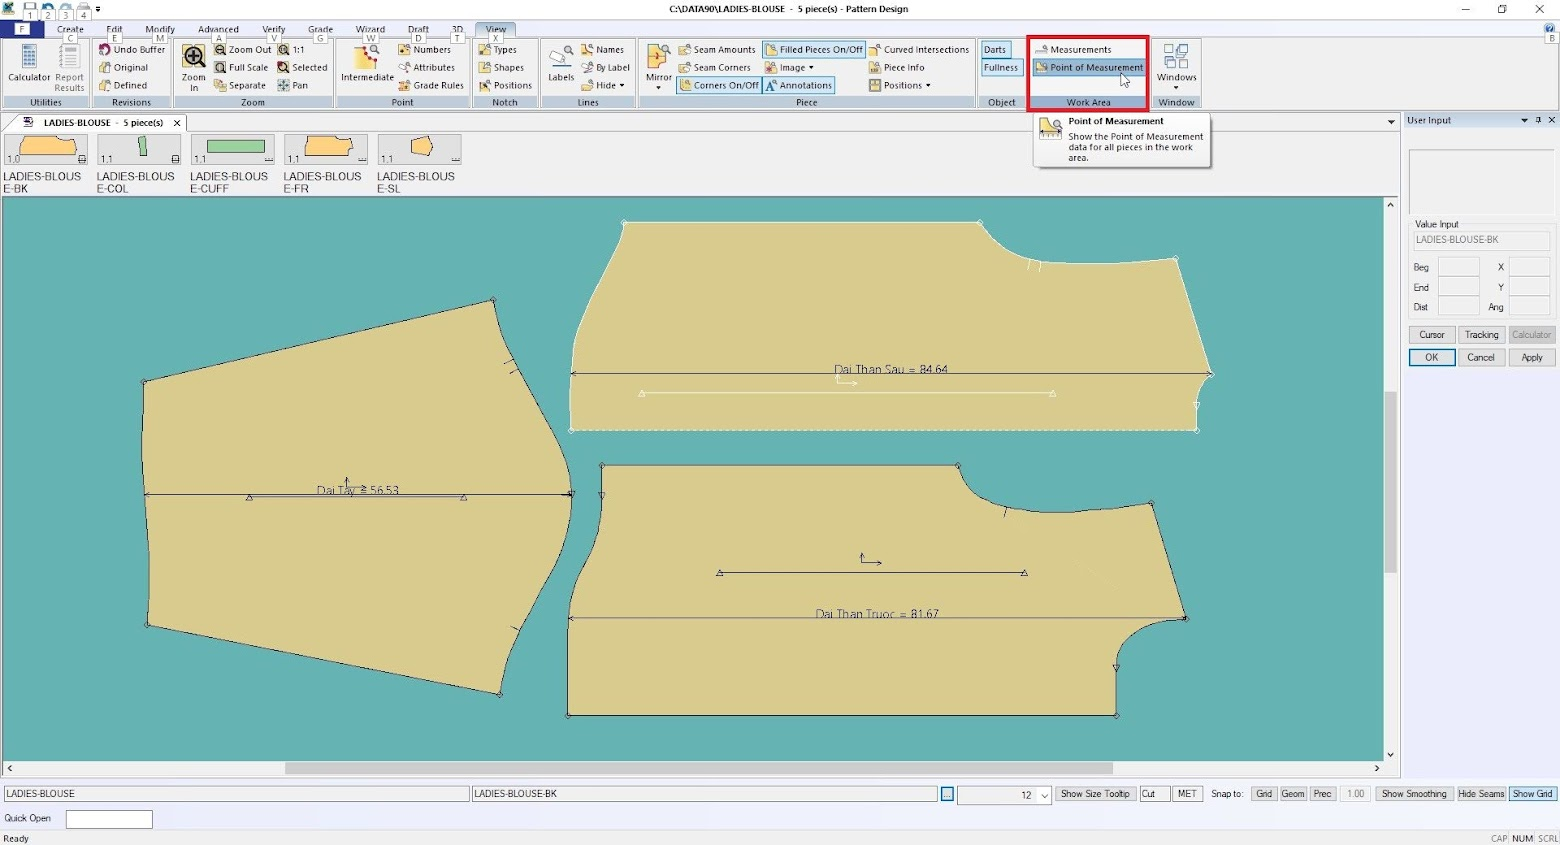 Gerber Pattern Design Point of Measurement: Cách Tạo Bảng Đo Thông Số 15